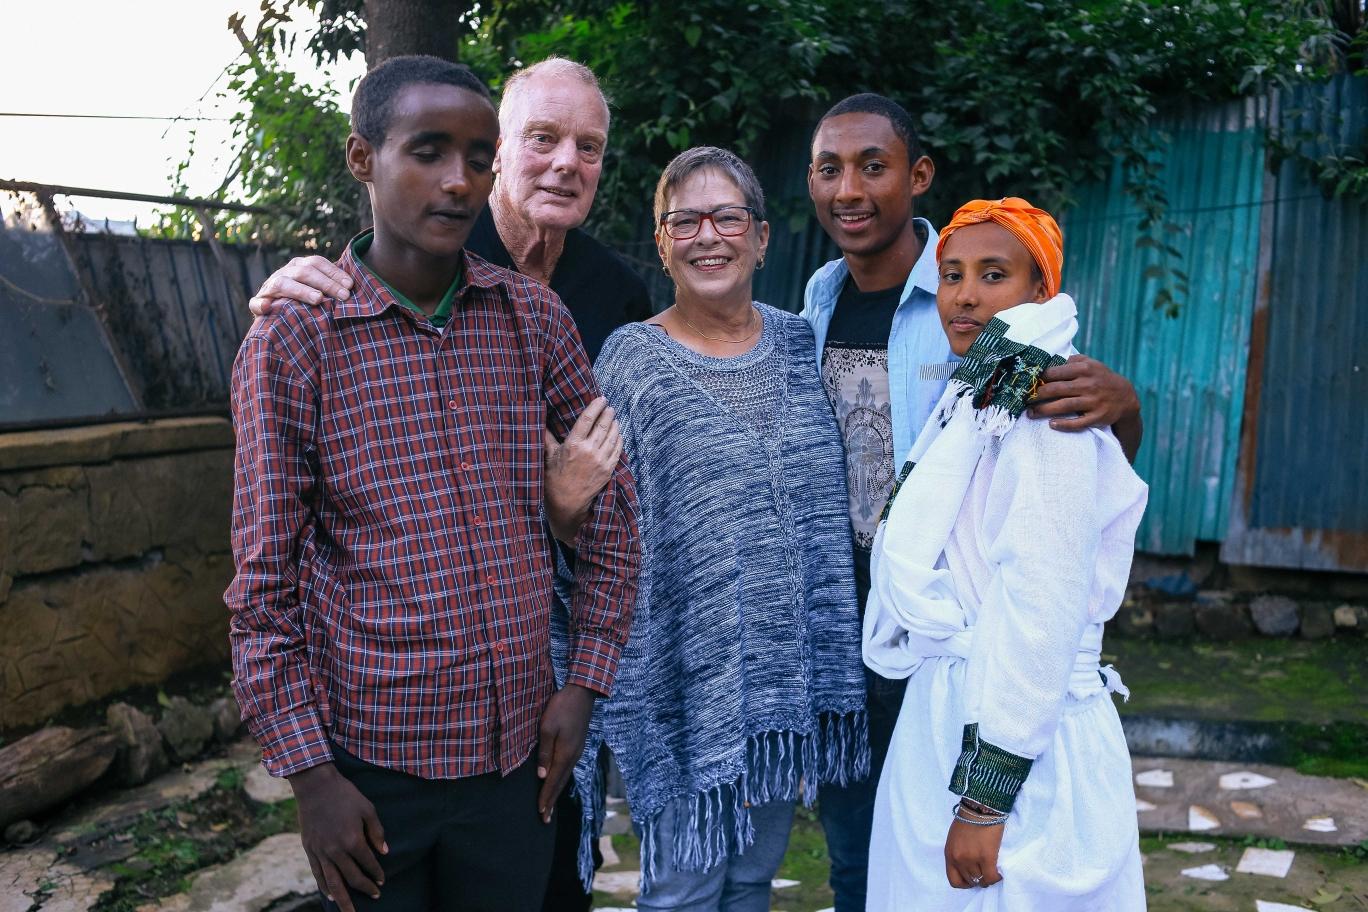 Sharon and George with Biruh, Temmar and Sebi, the three children they sponsor